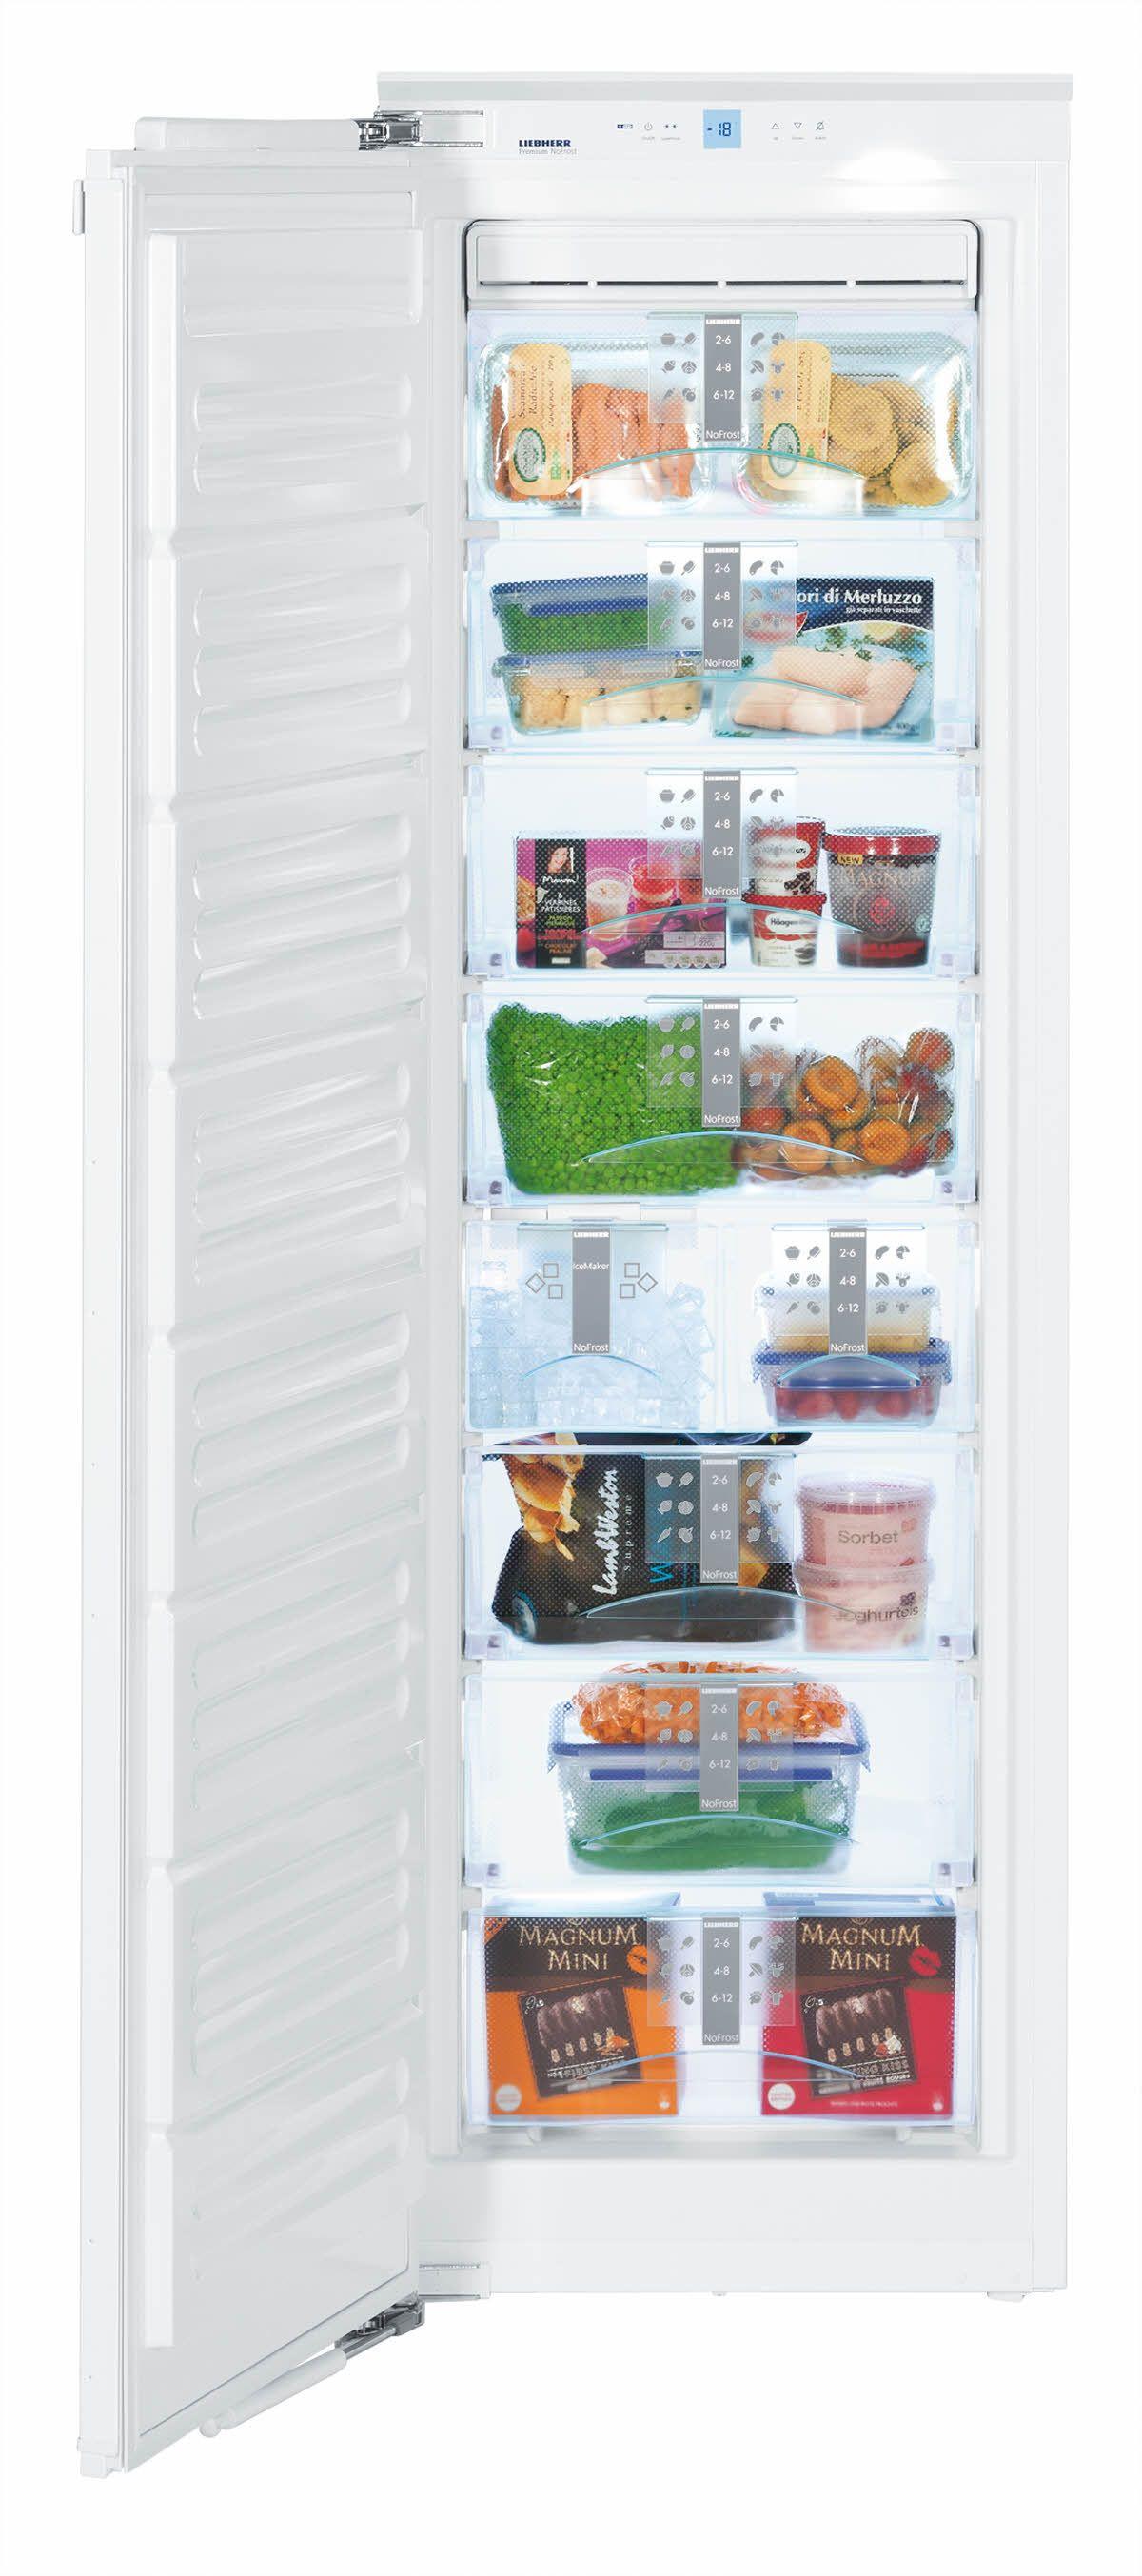 SIGN 3566 Premium NoFrost   Home Décor - Kitchens   Pinterest   Kitchens